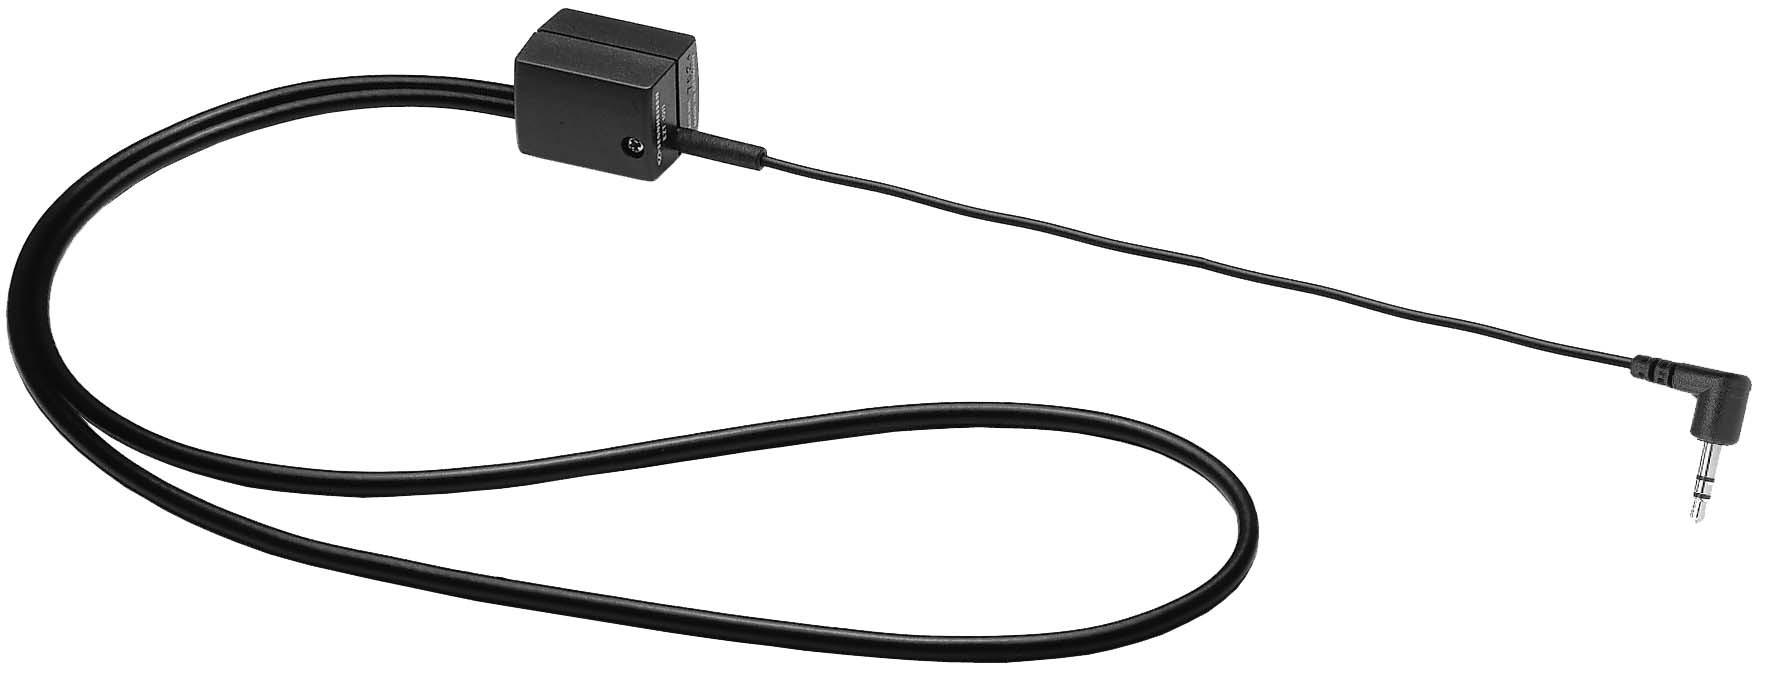 EZT-1011 Induction Neckloop, 3.5-mm plug